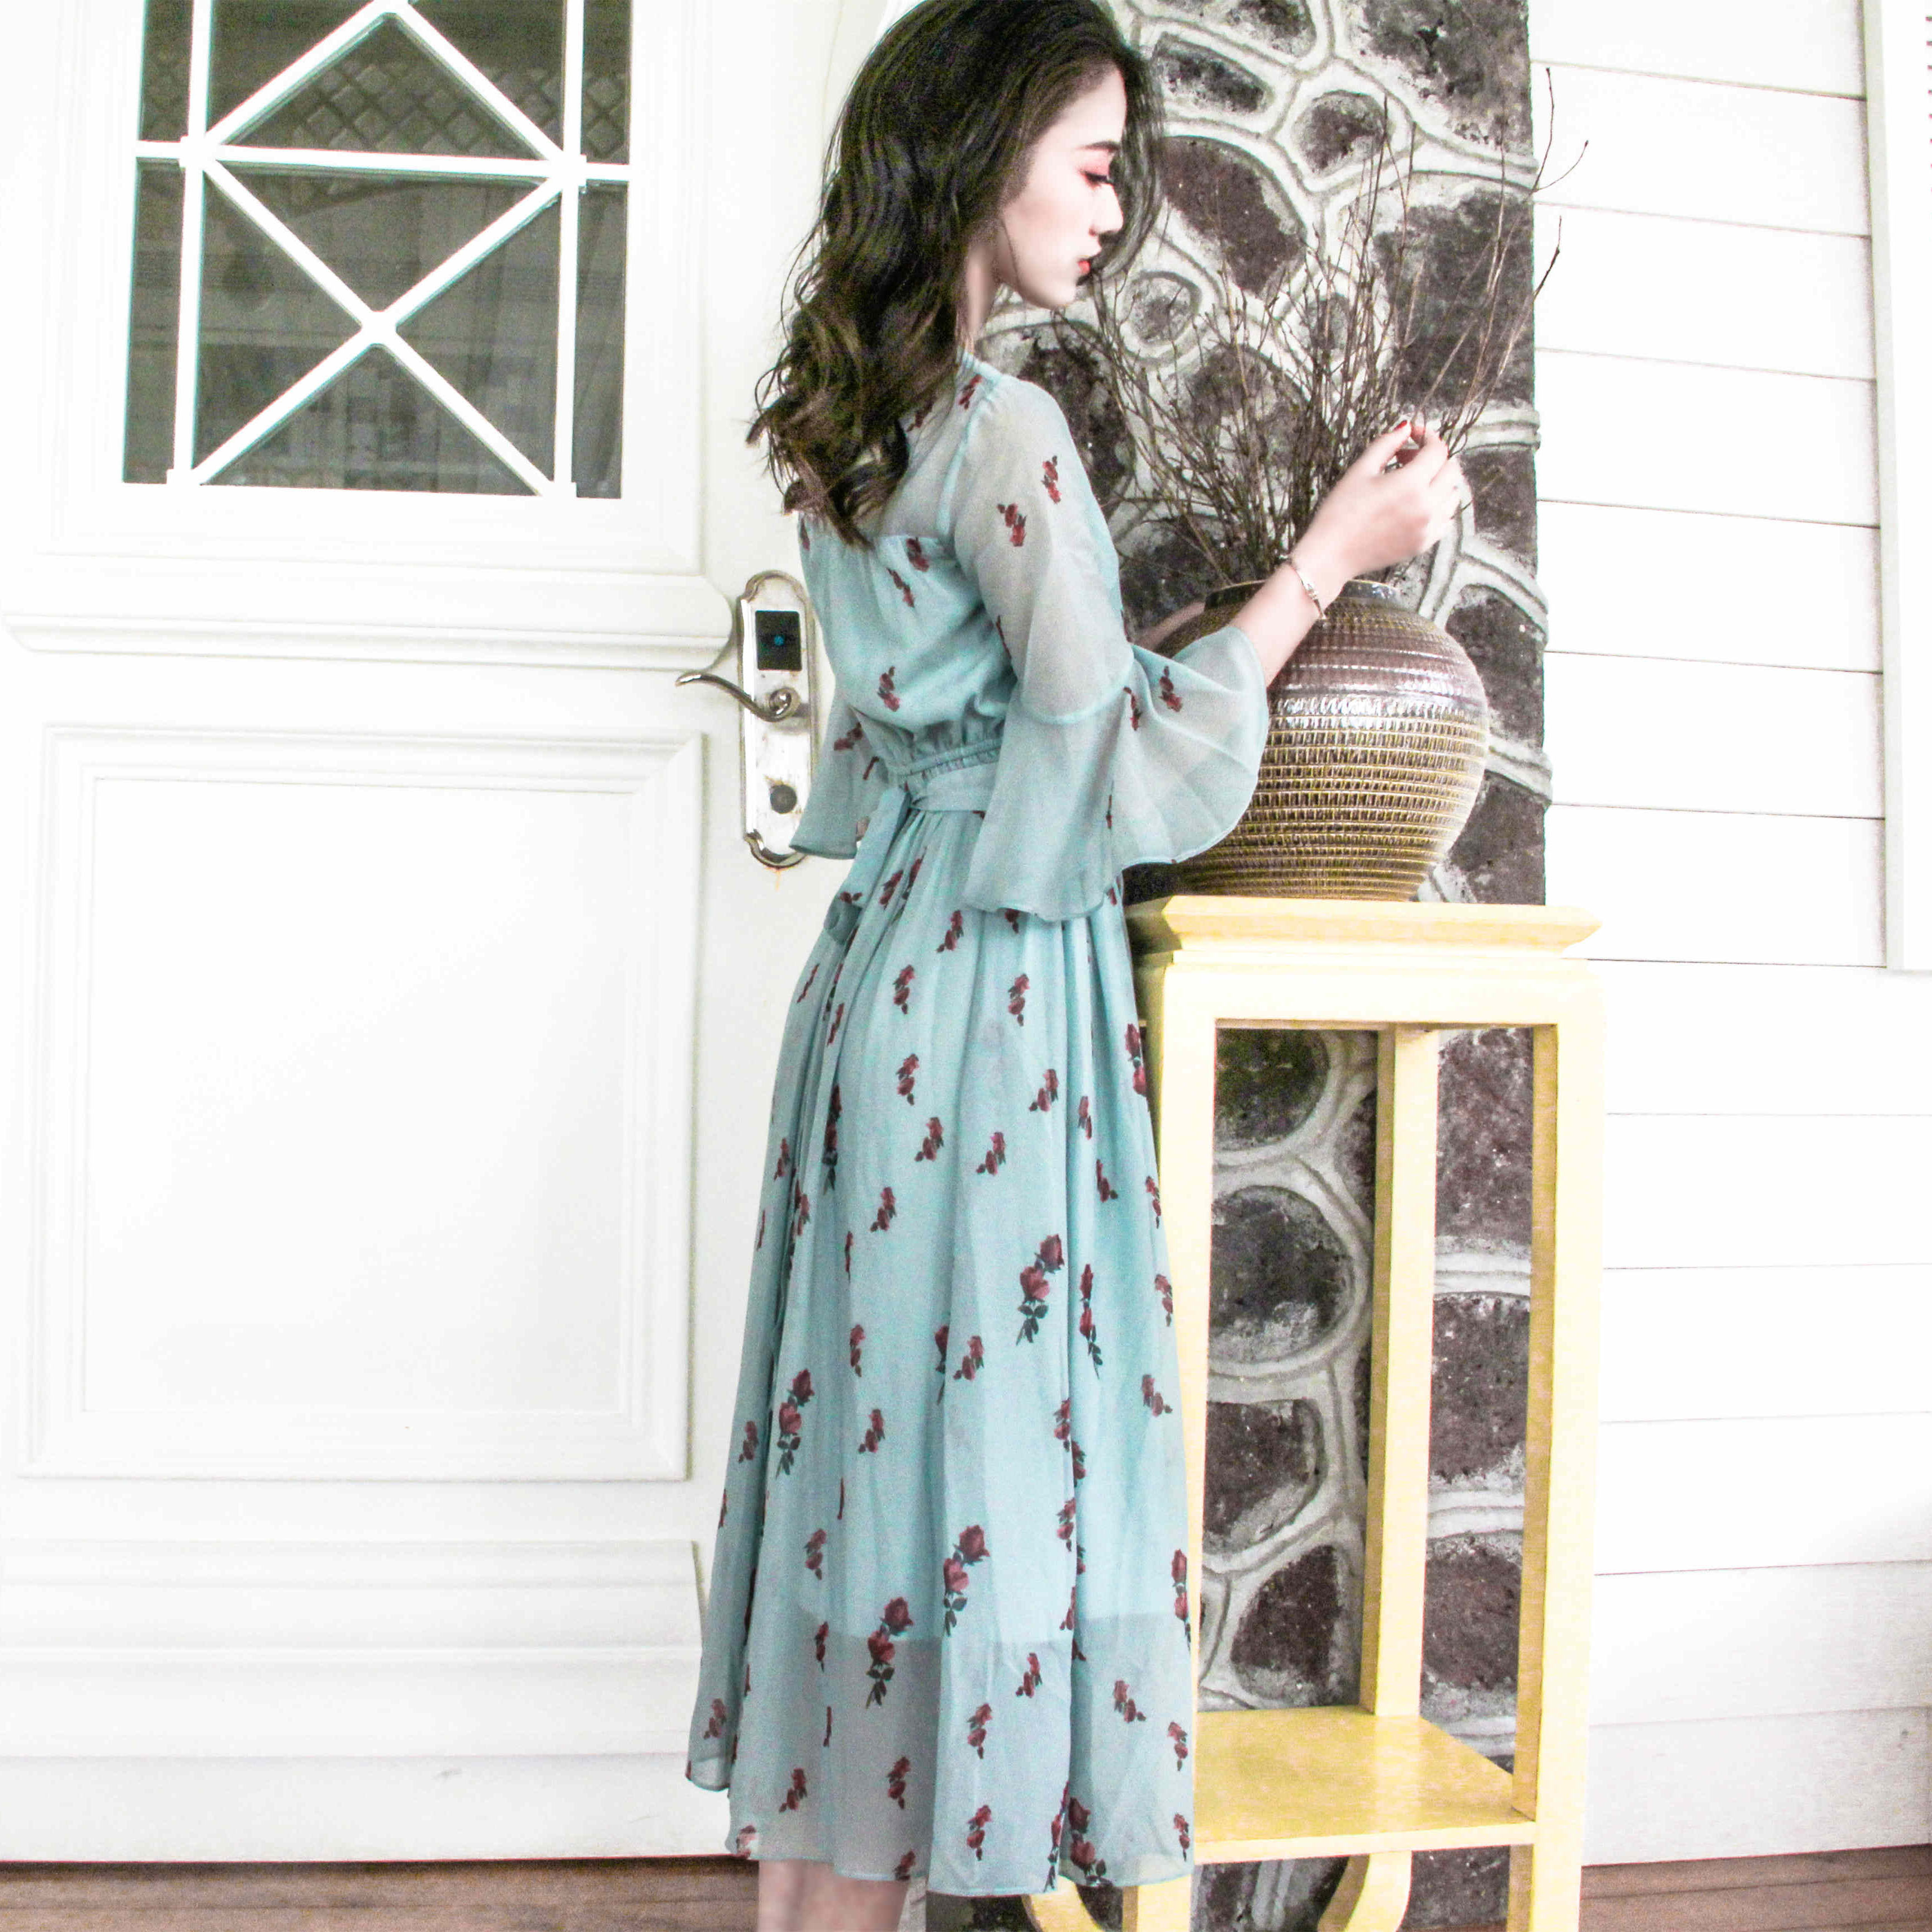 e4aa01ce82f8e US $26.52  2017 spring new women dress korean vintage chiffon floral print  dresses elastic waist female vestidos boho elegant shirt dress-in Dresses  ...